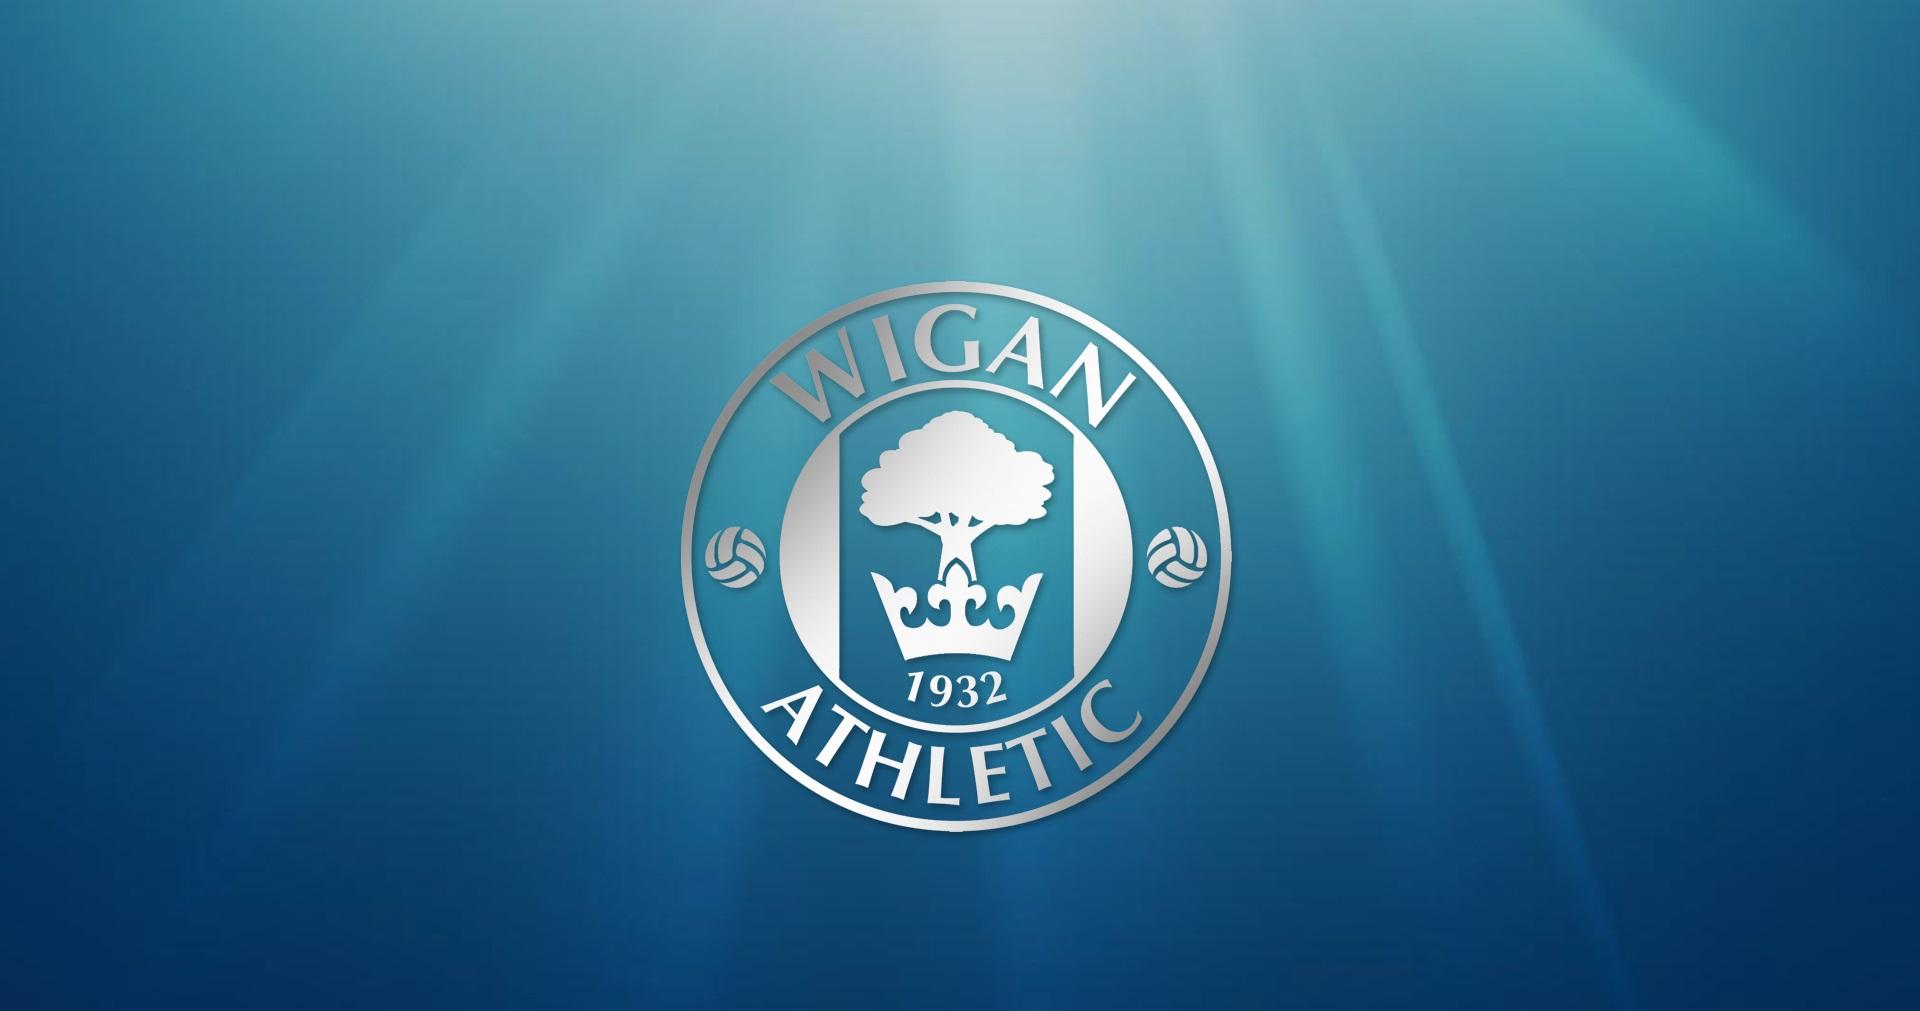 Ricardo Kaka Wallpapers Hd Wigan Athletic F C Logo Wallpaper Wallpaperlists Com